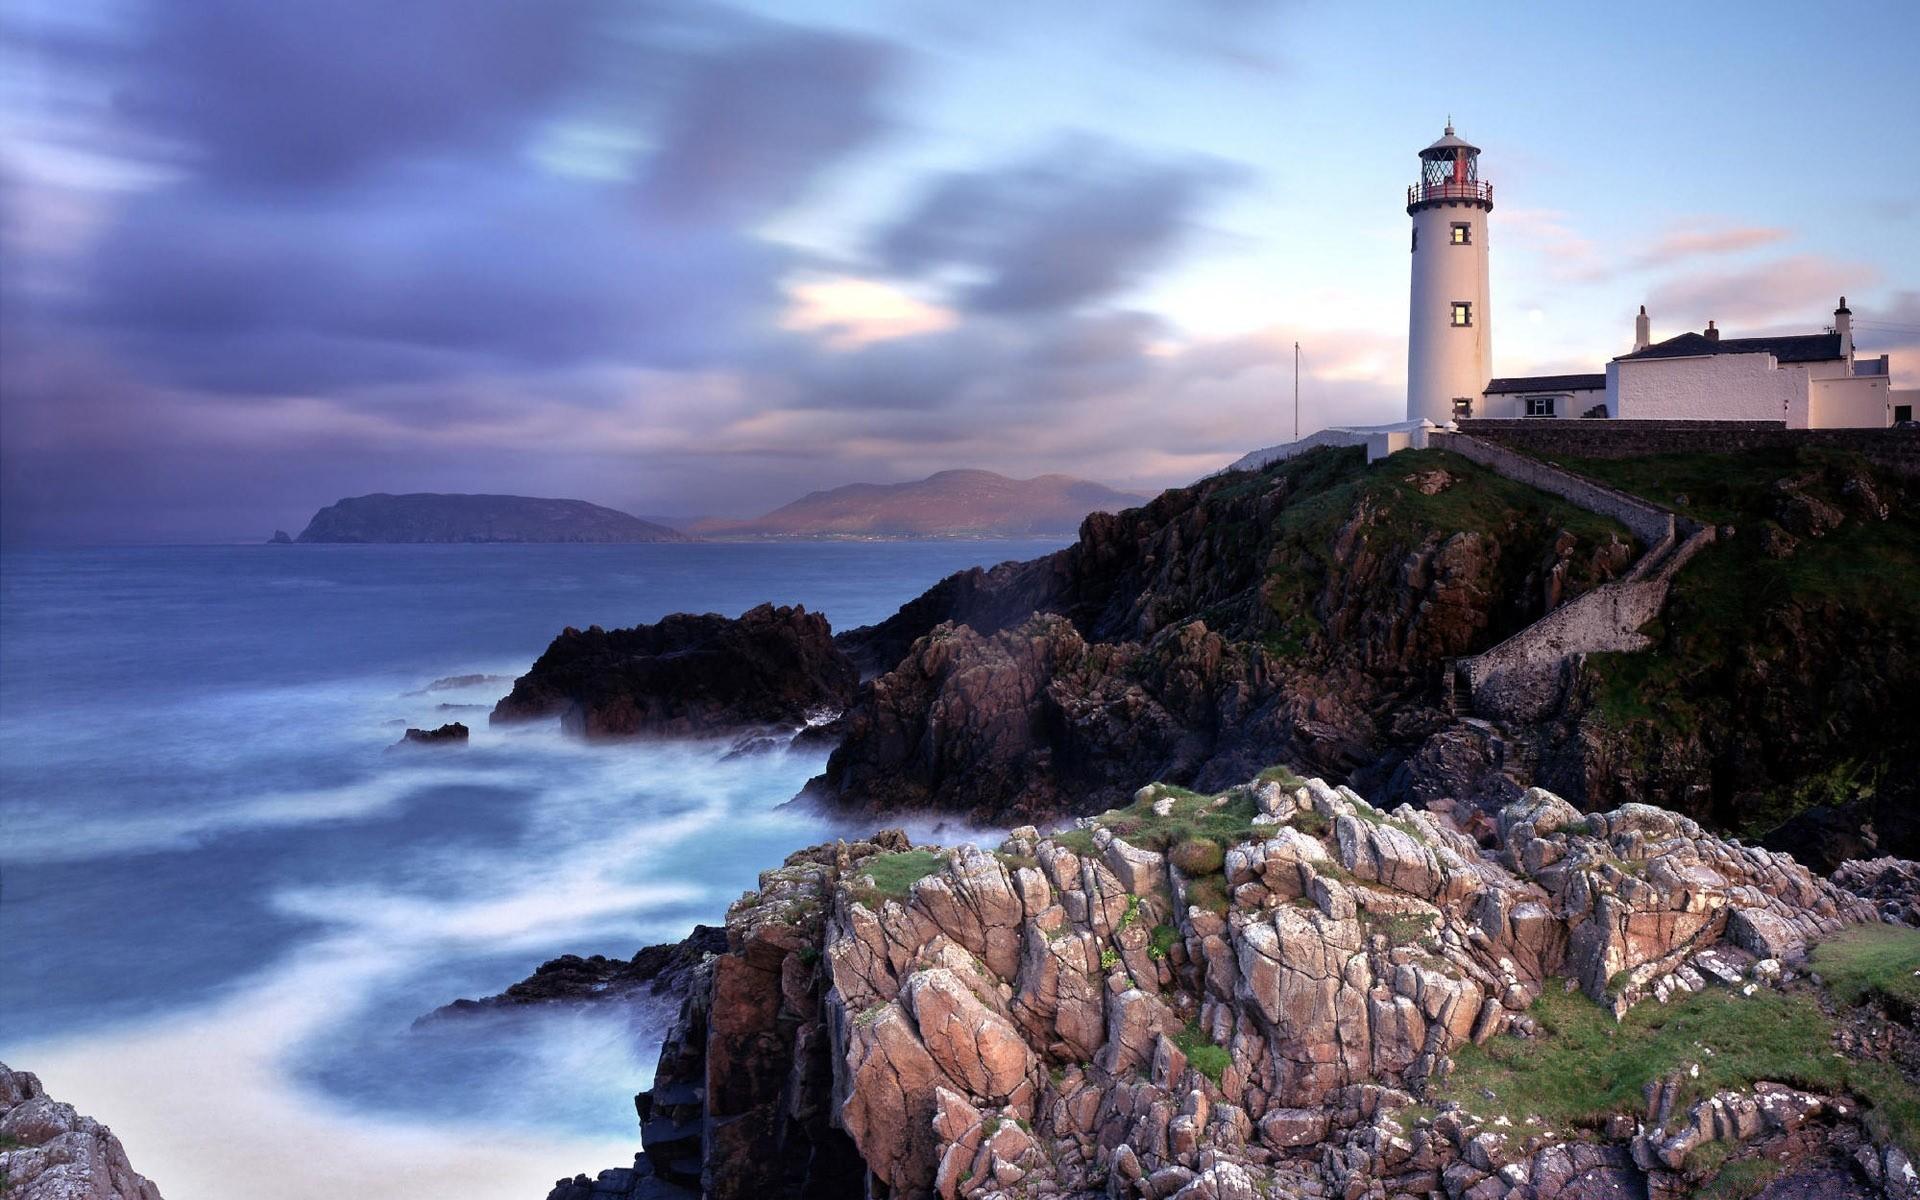 природа маяк море скалы  № 2238527 бесплатно